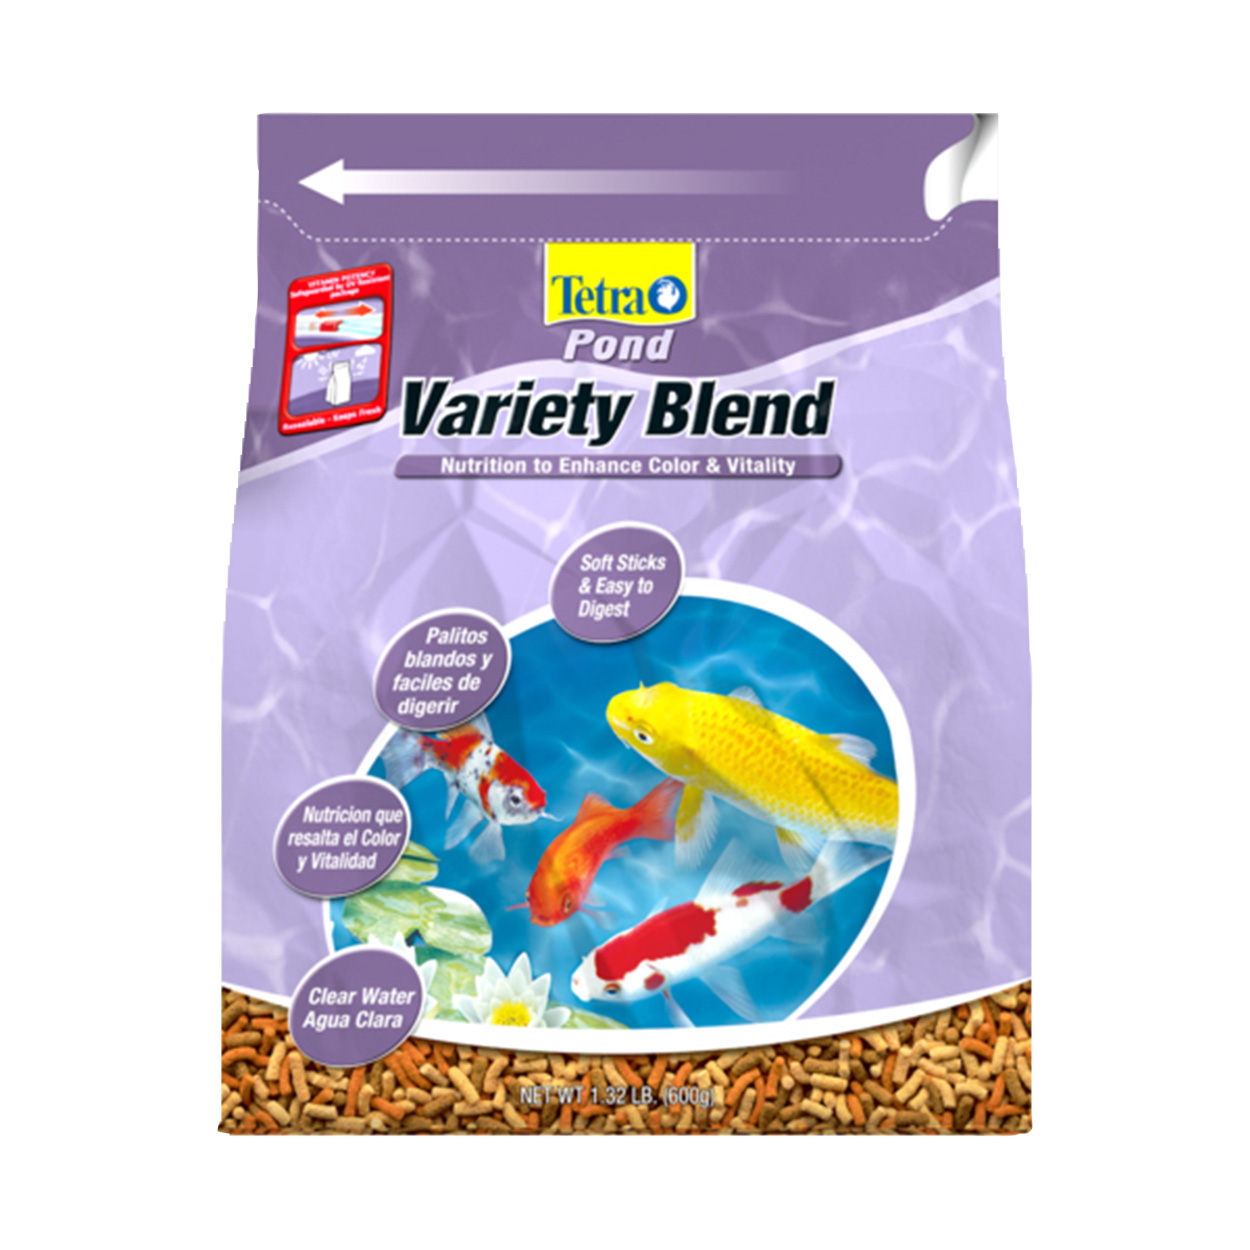 TetraPond Variety Blend - 1.32 lb 14796